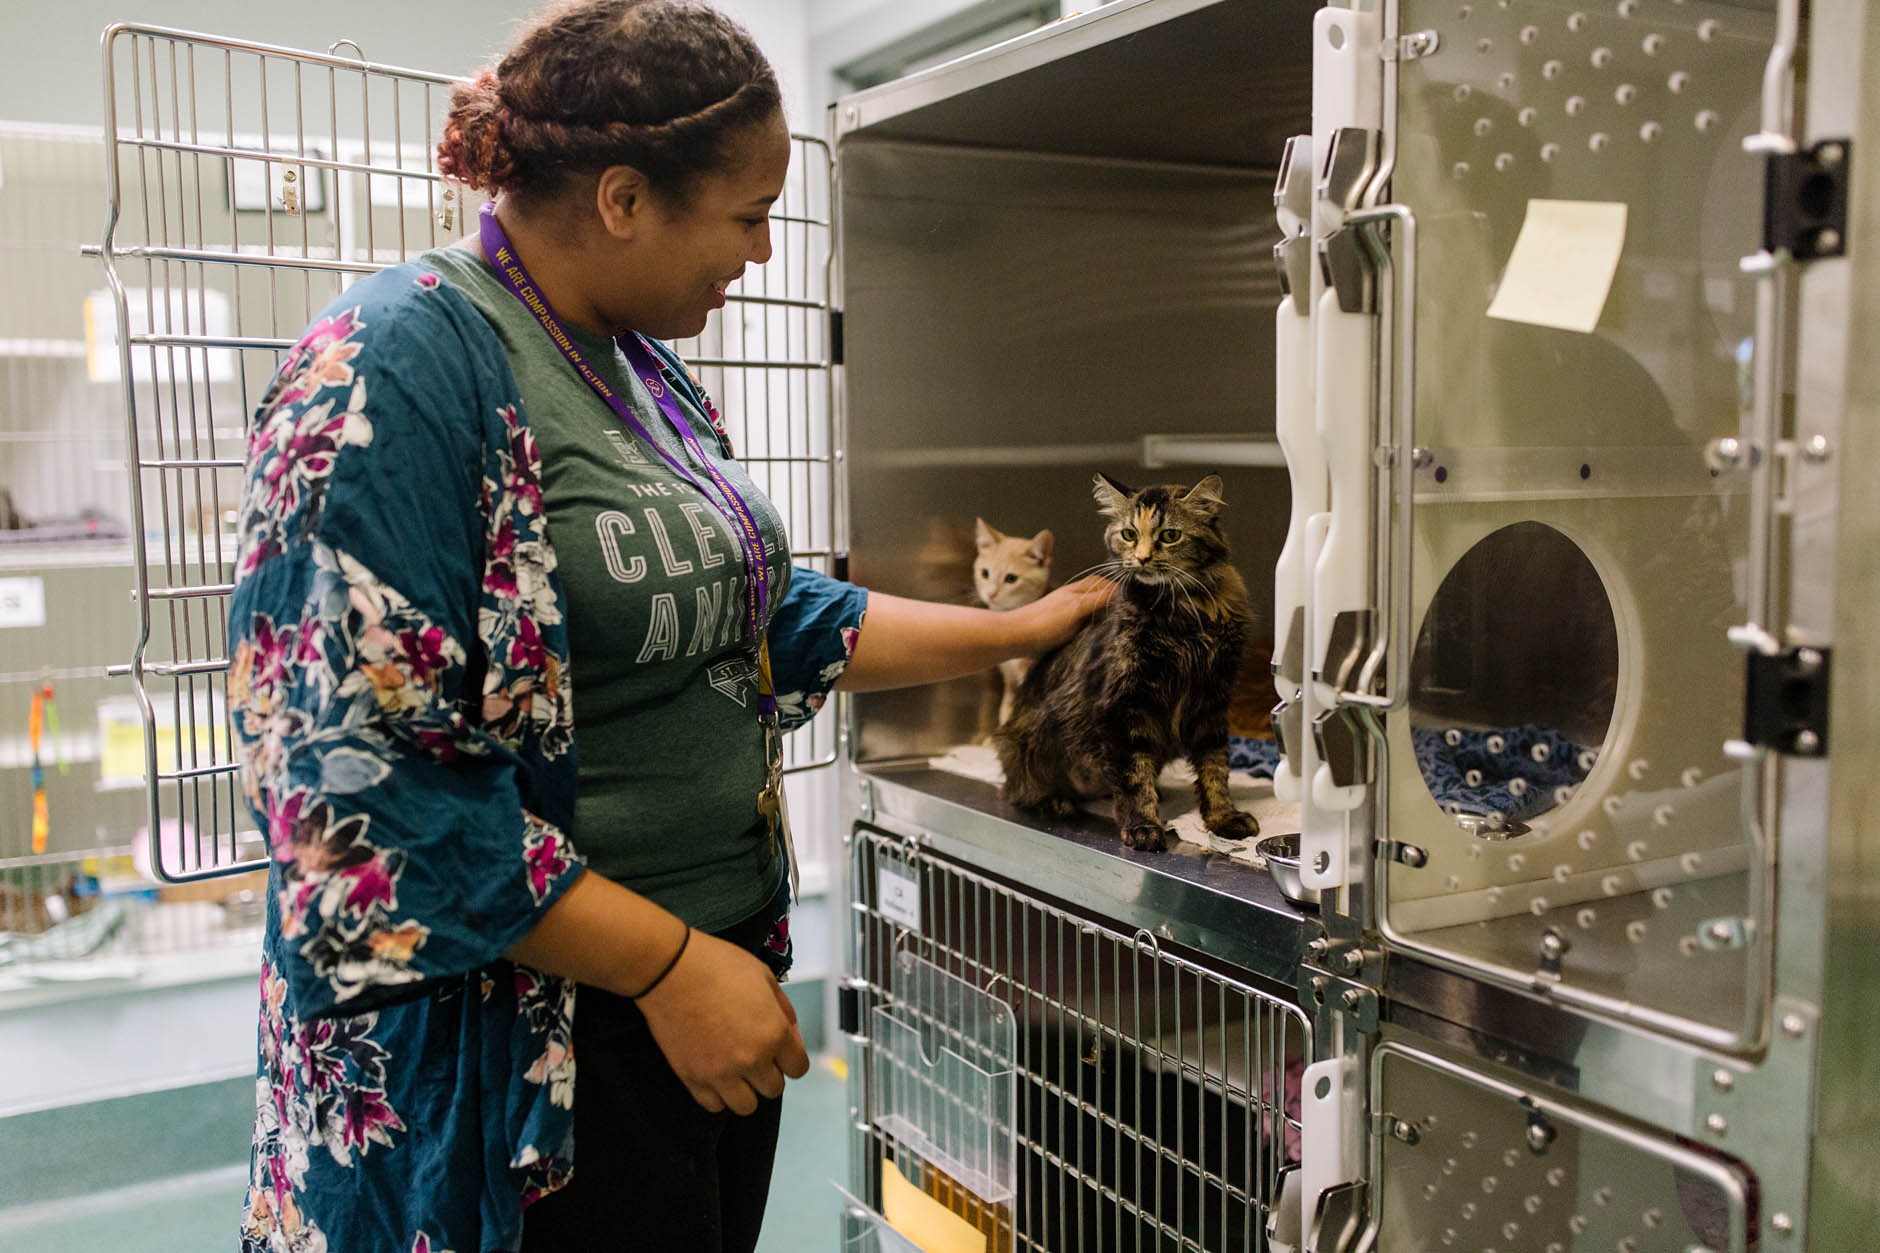 Your Neighborhood: Cleveland Animal Protective League